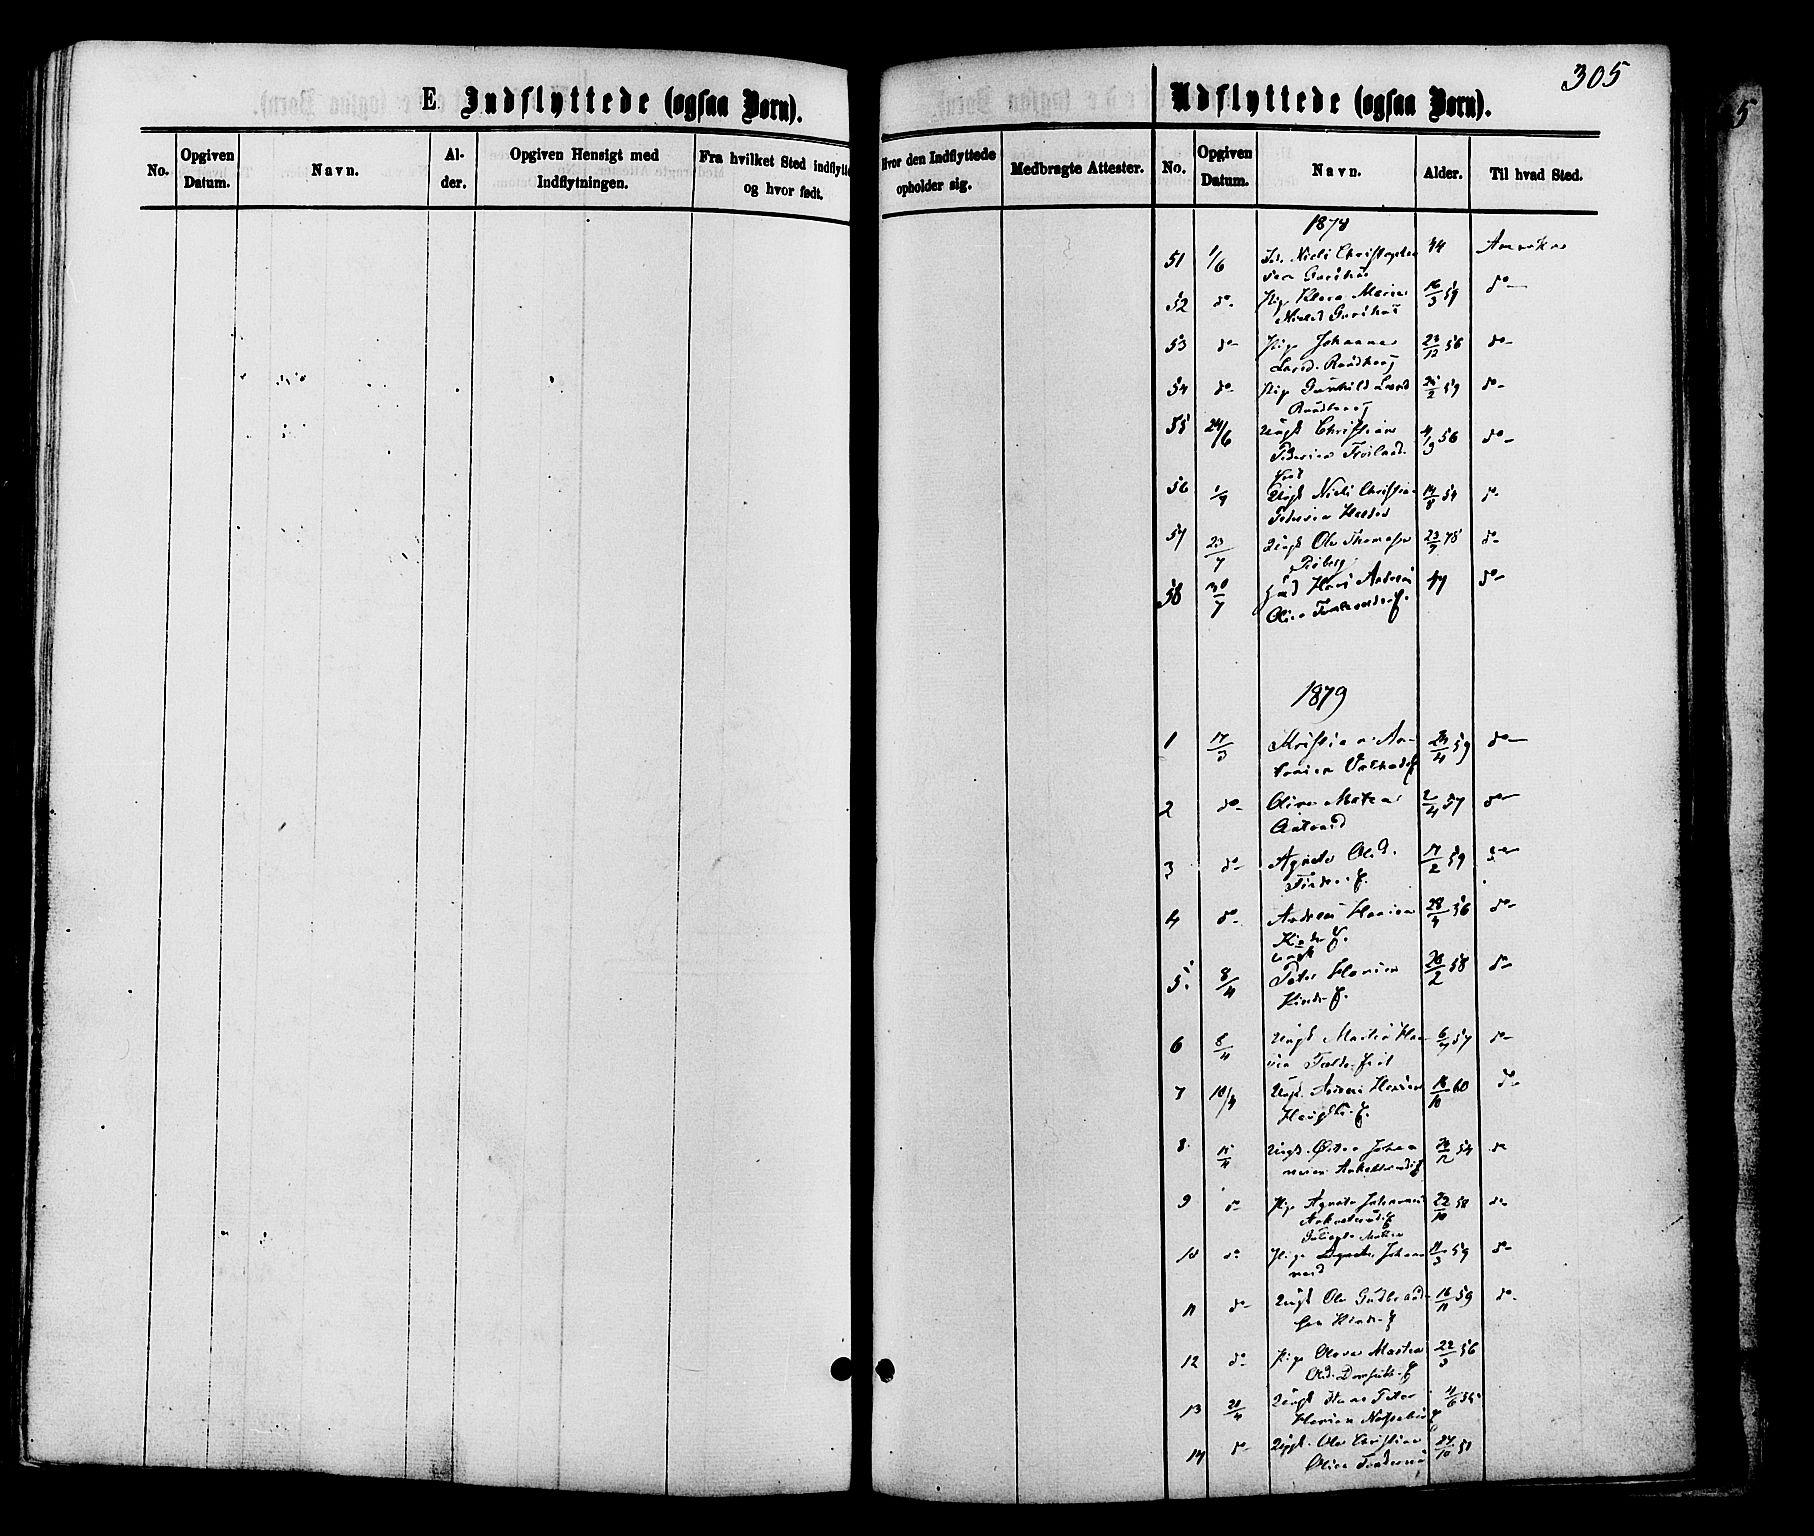 SAH, Nordre Land prestekontor, Ministerialbok nr. 2, 1872-1881, s. 305